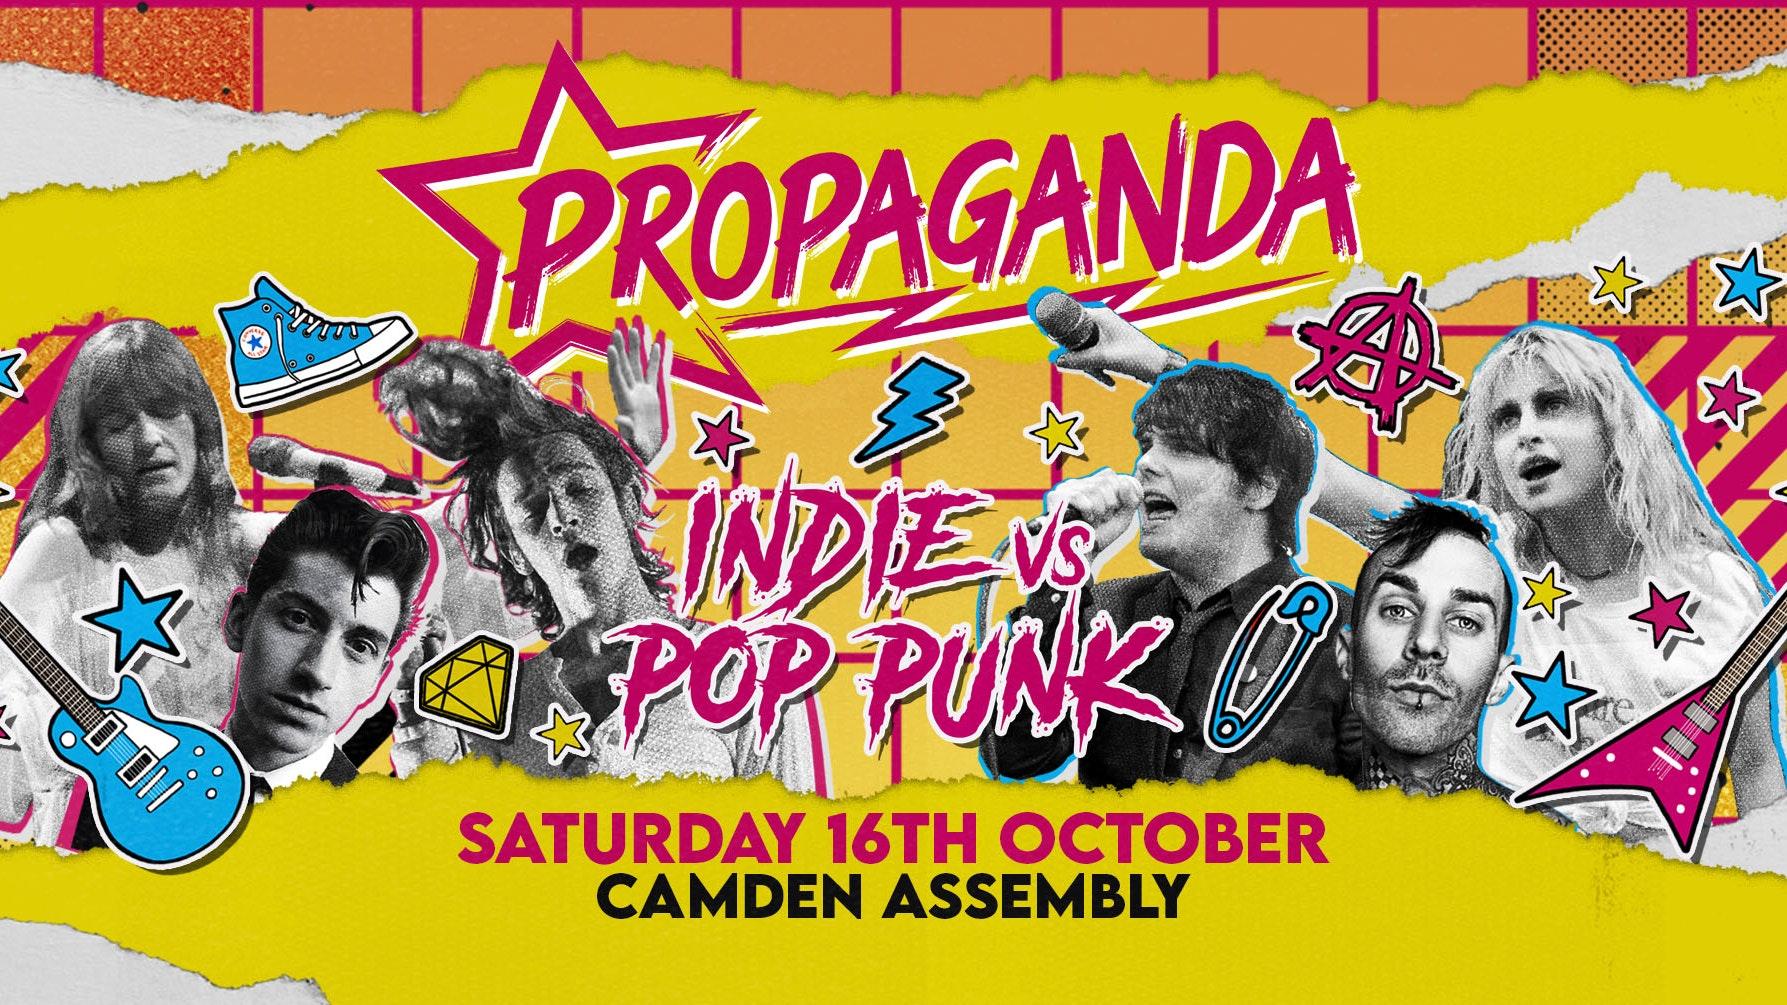 Propaganda London – Indie vs Pop-Punk Party!